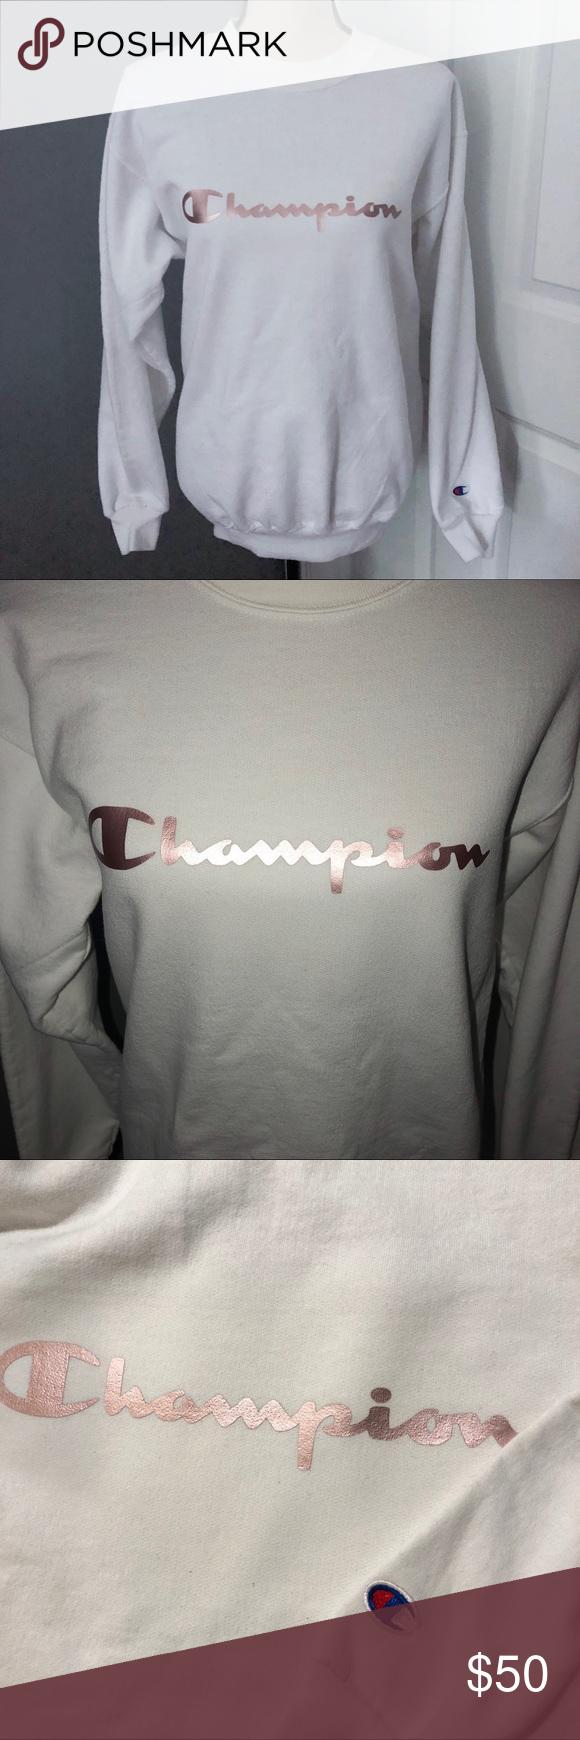 Champions Rose Gold Logo Graphic Sweatshirt Vintage Sweaters Rose Gold Logo Graphic Sweatshirt [ 1740 x 580 Pixel ]